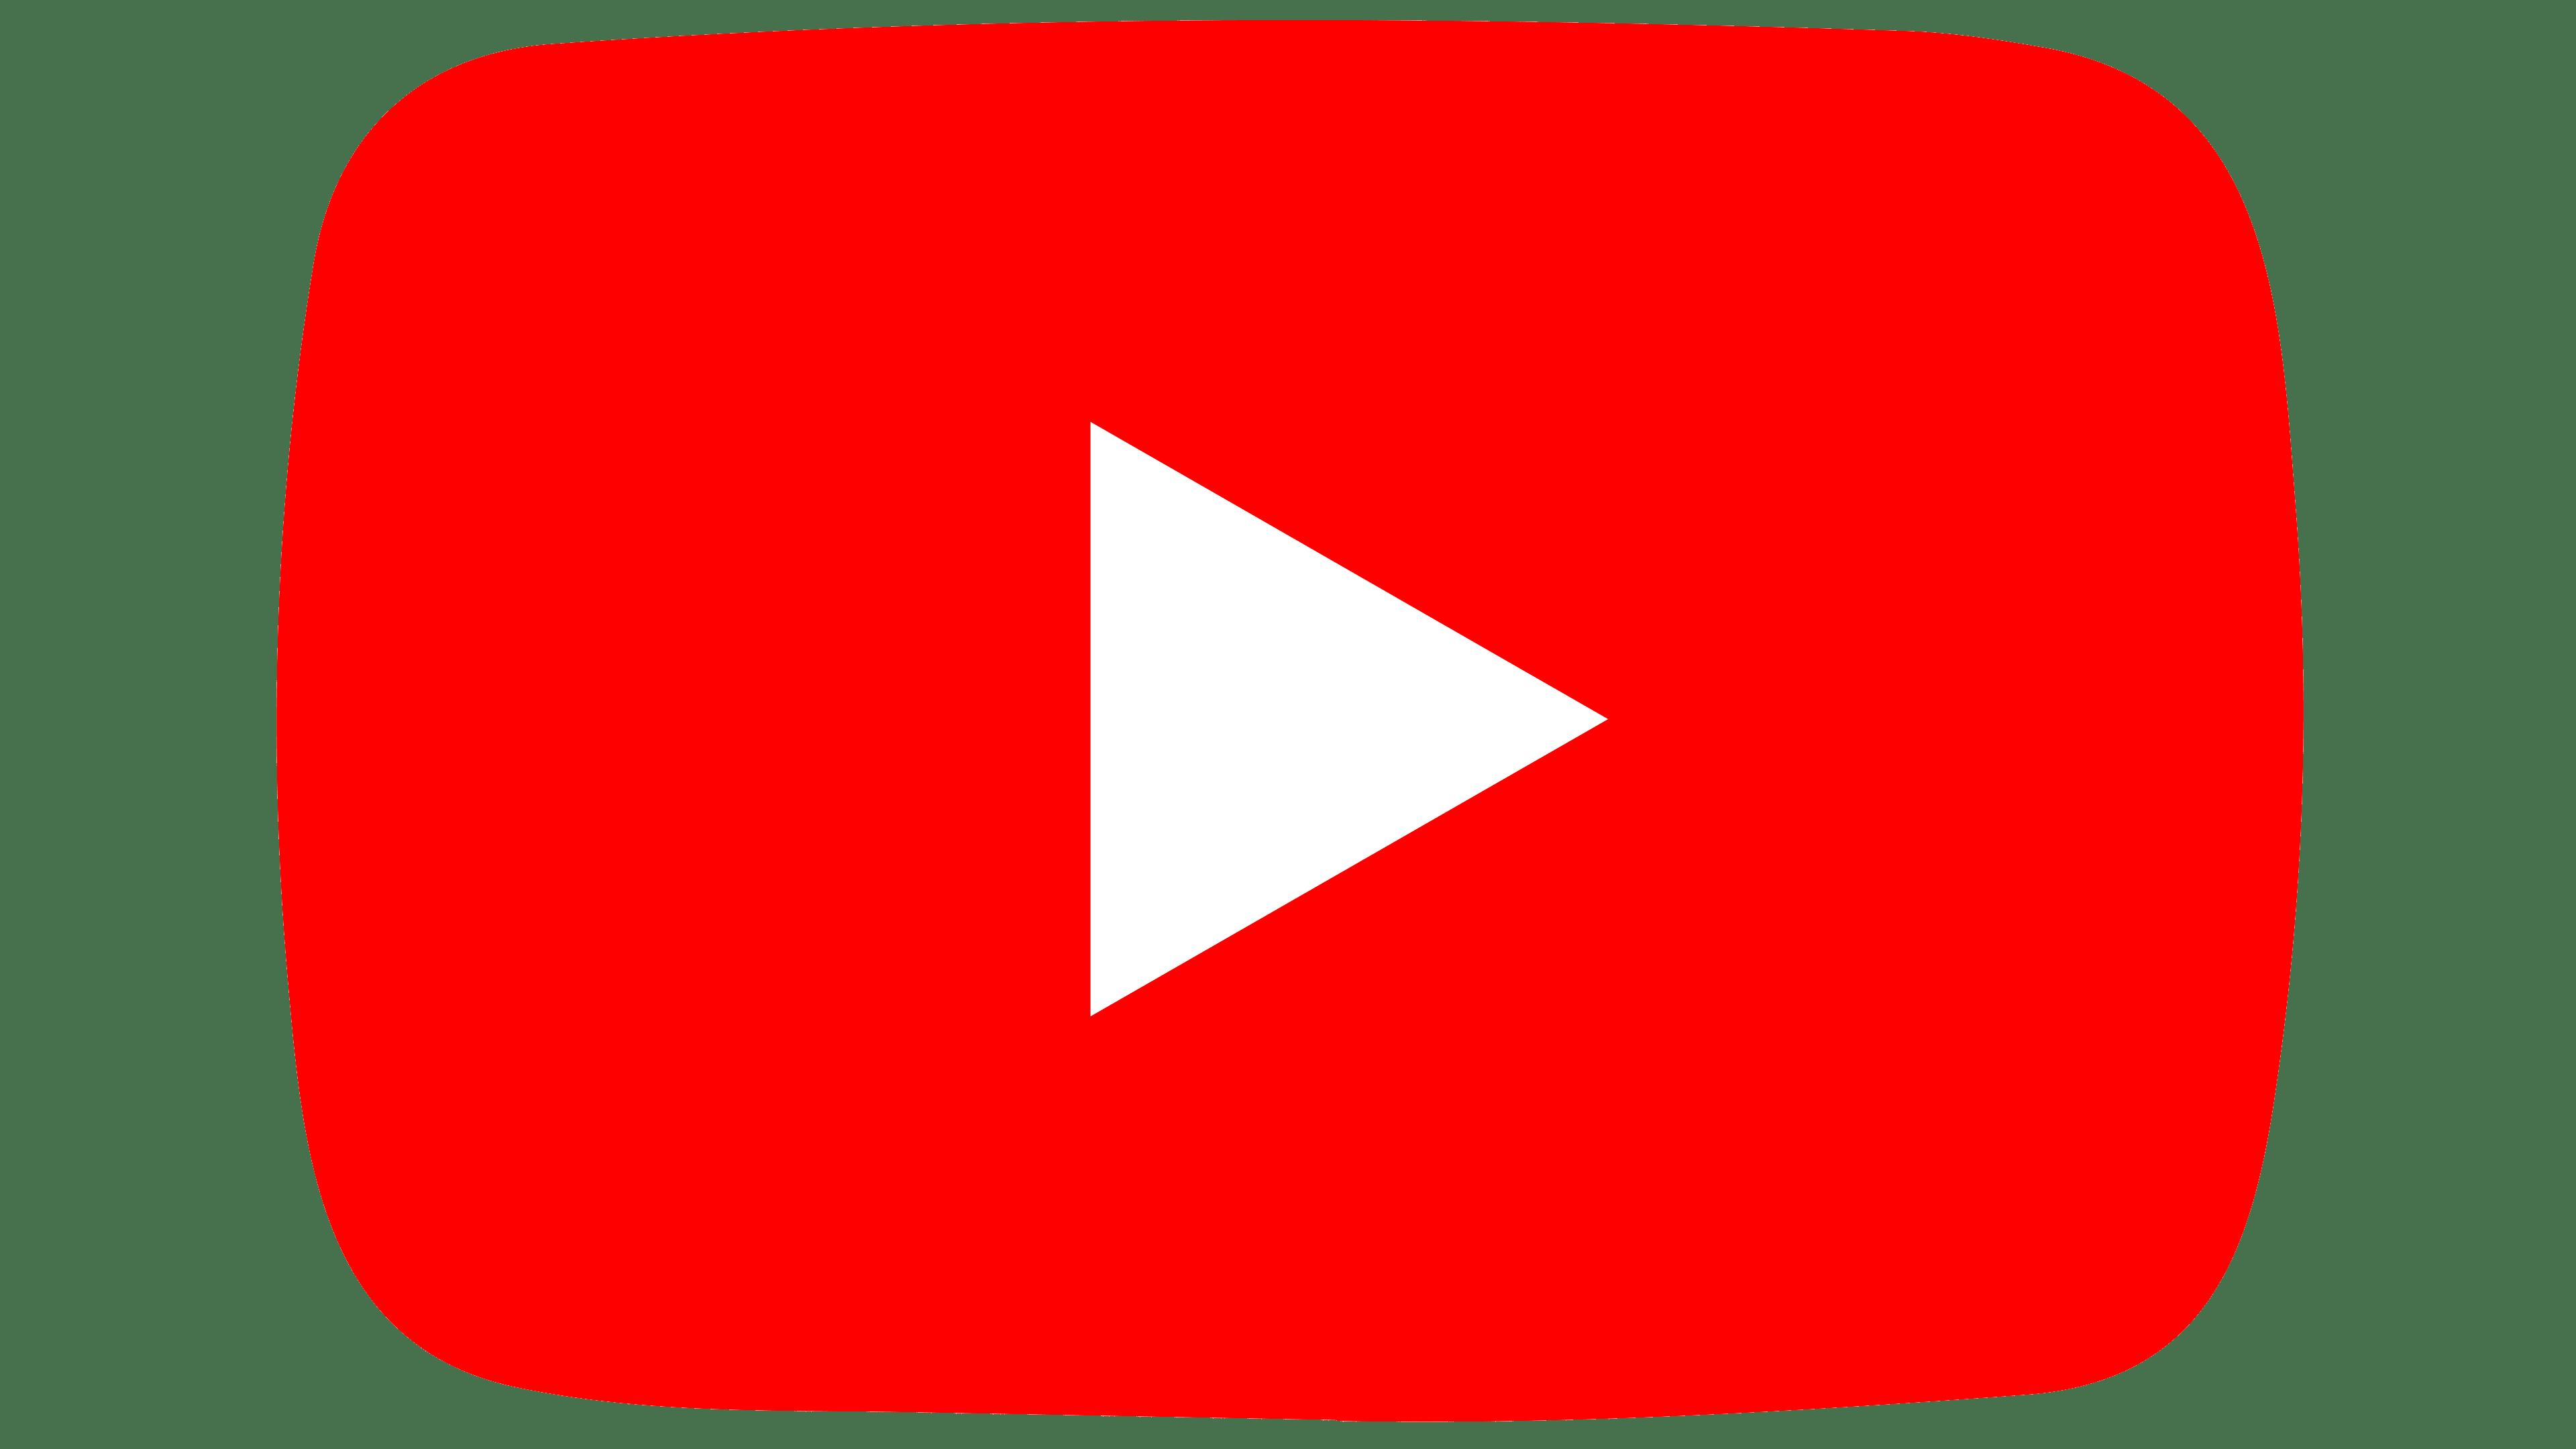 YouTube Emblem